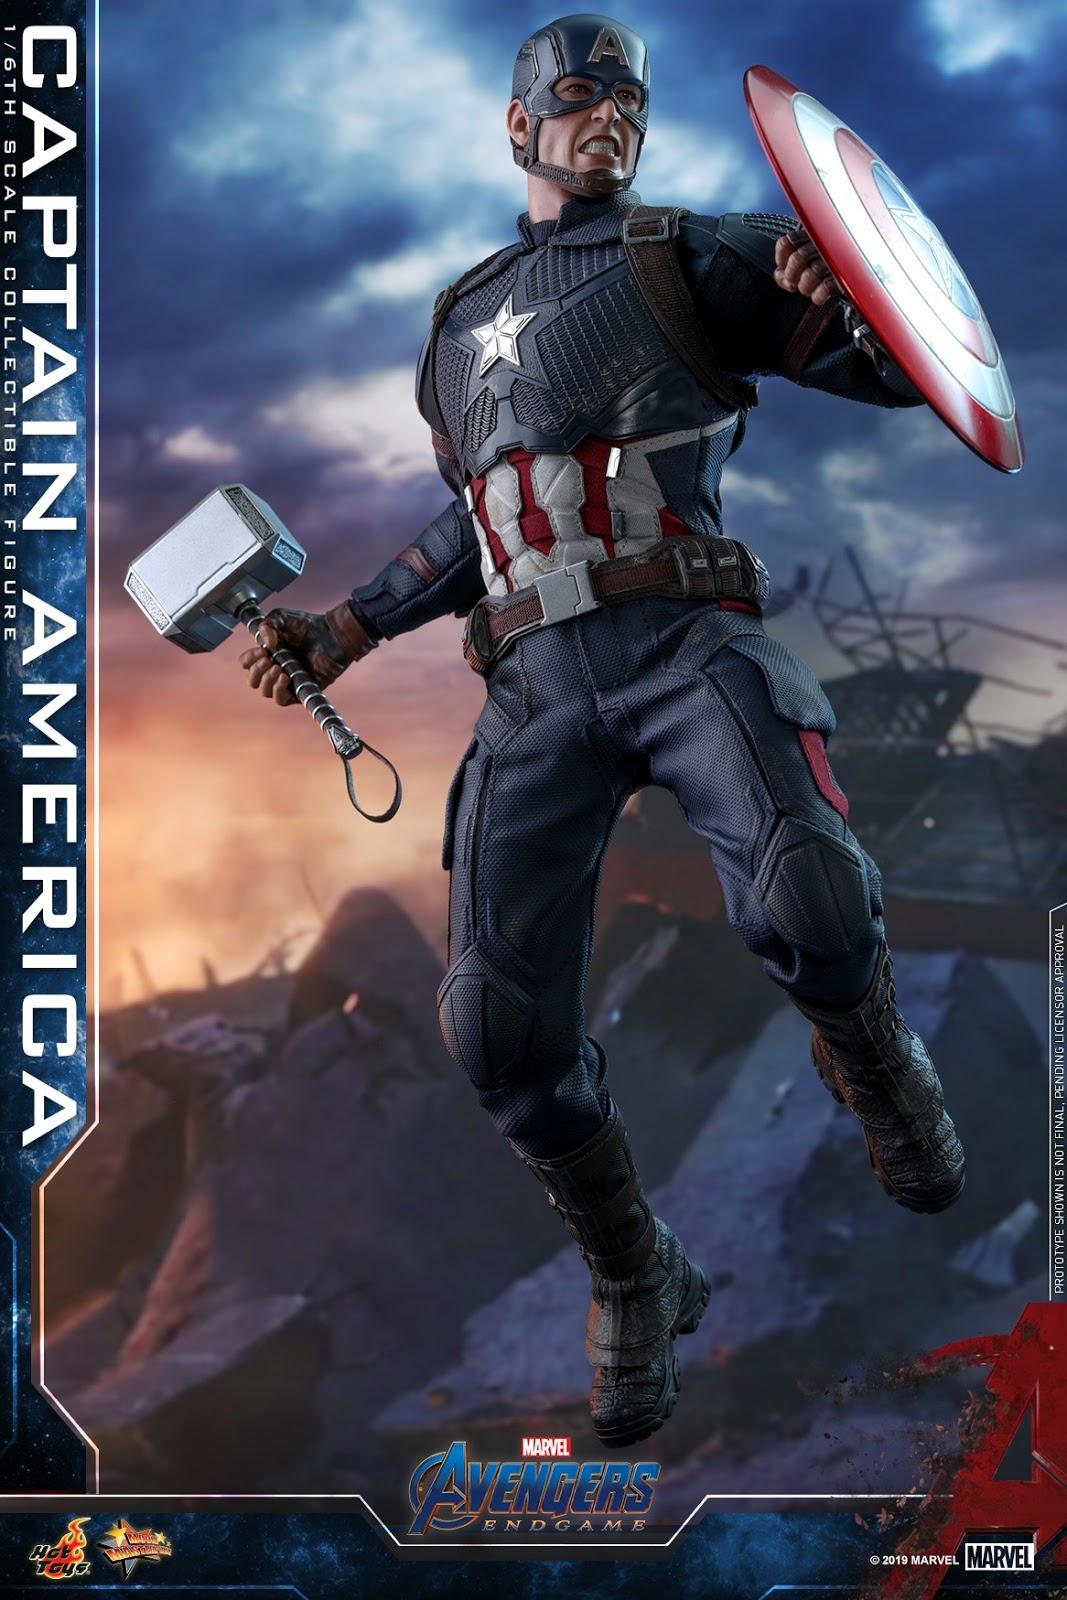 toyhaven: Hot Toys Avengers: Endgame 1/6th scale Chris ...